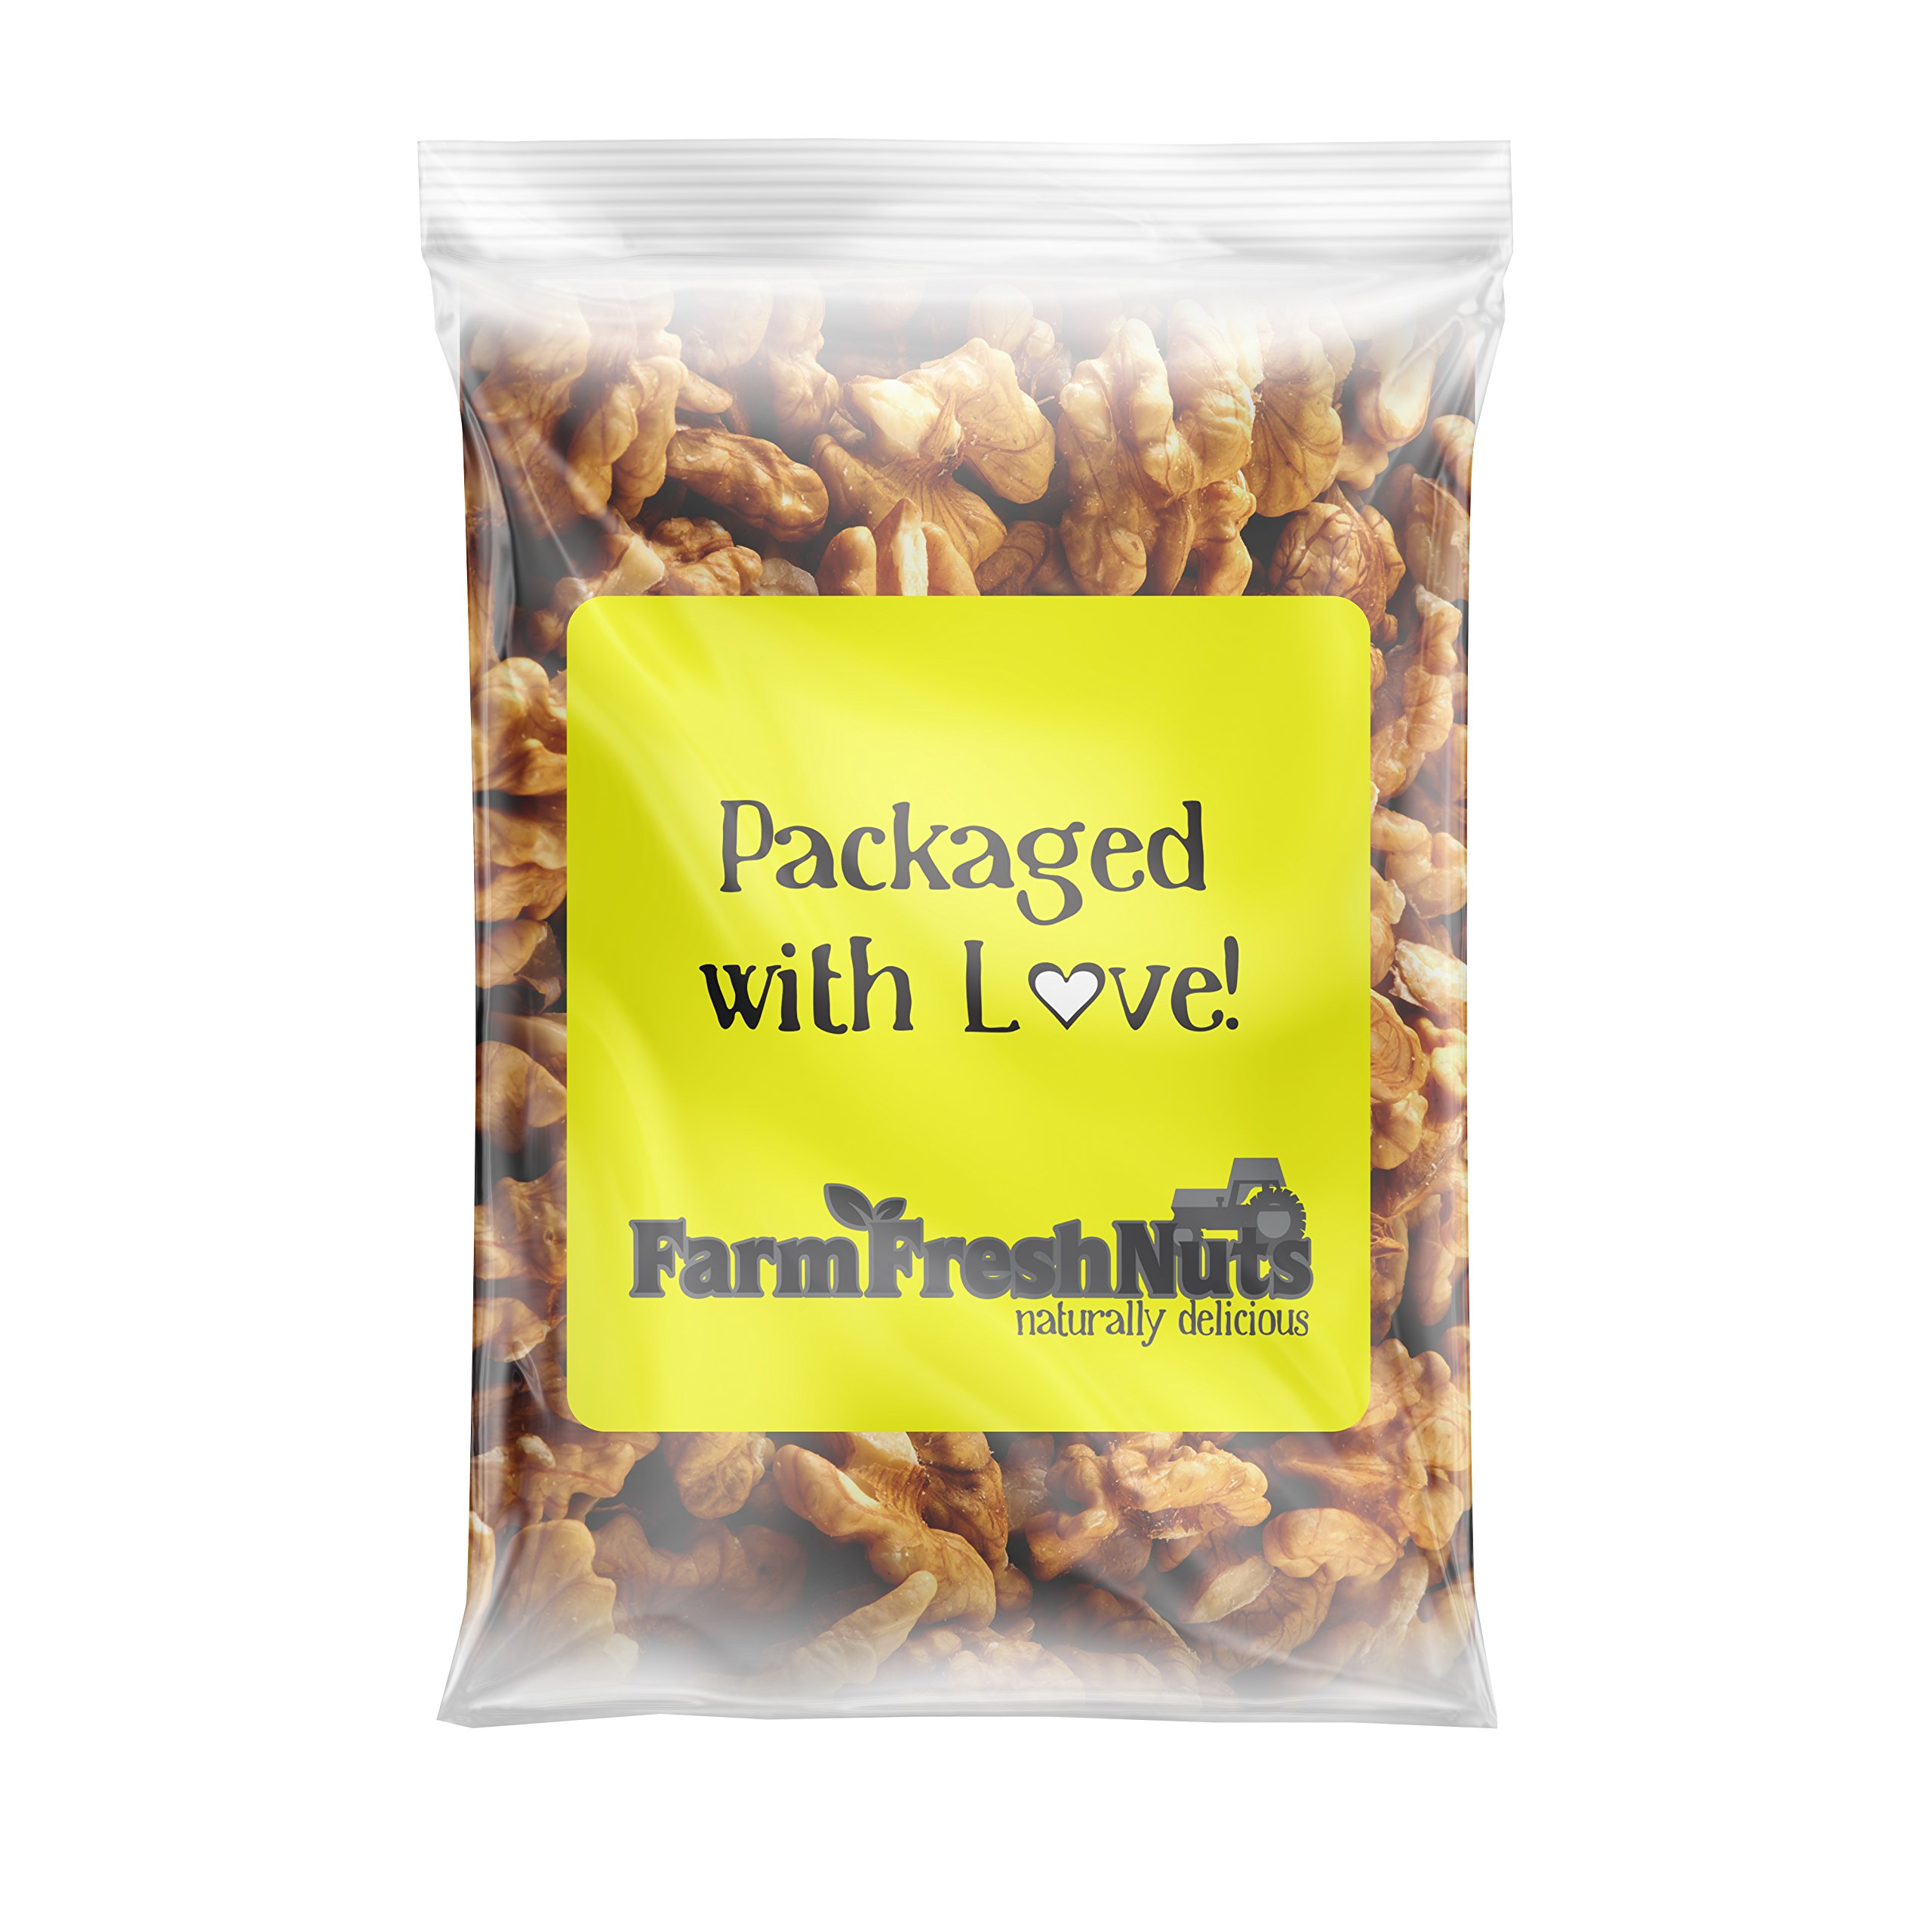 CALIFORNIA WALNUTS Halves & Pieces - Great Source of Omega 3 - Super Crunchy - (3 LB) by Farm Fresh Nuts